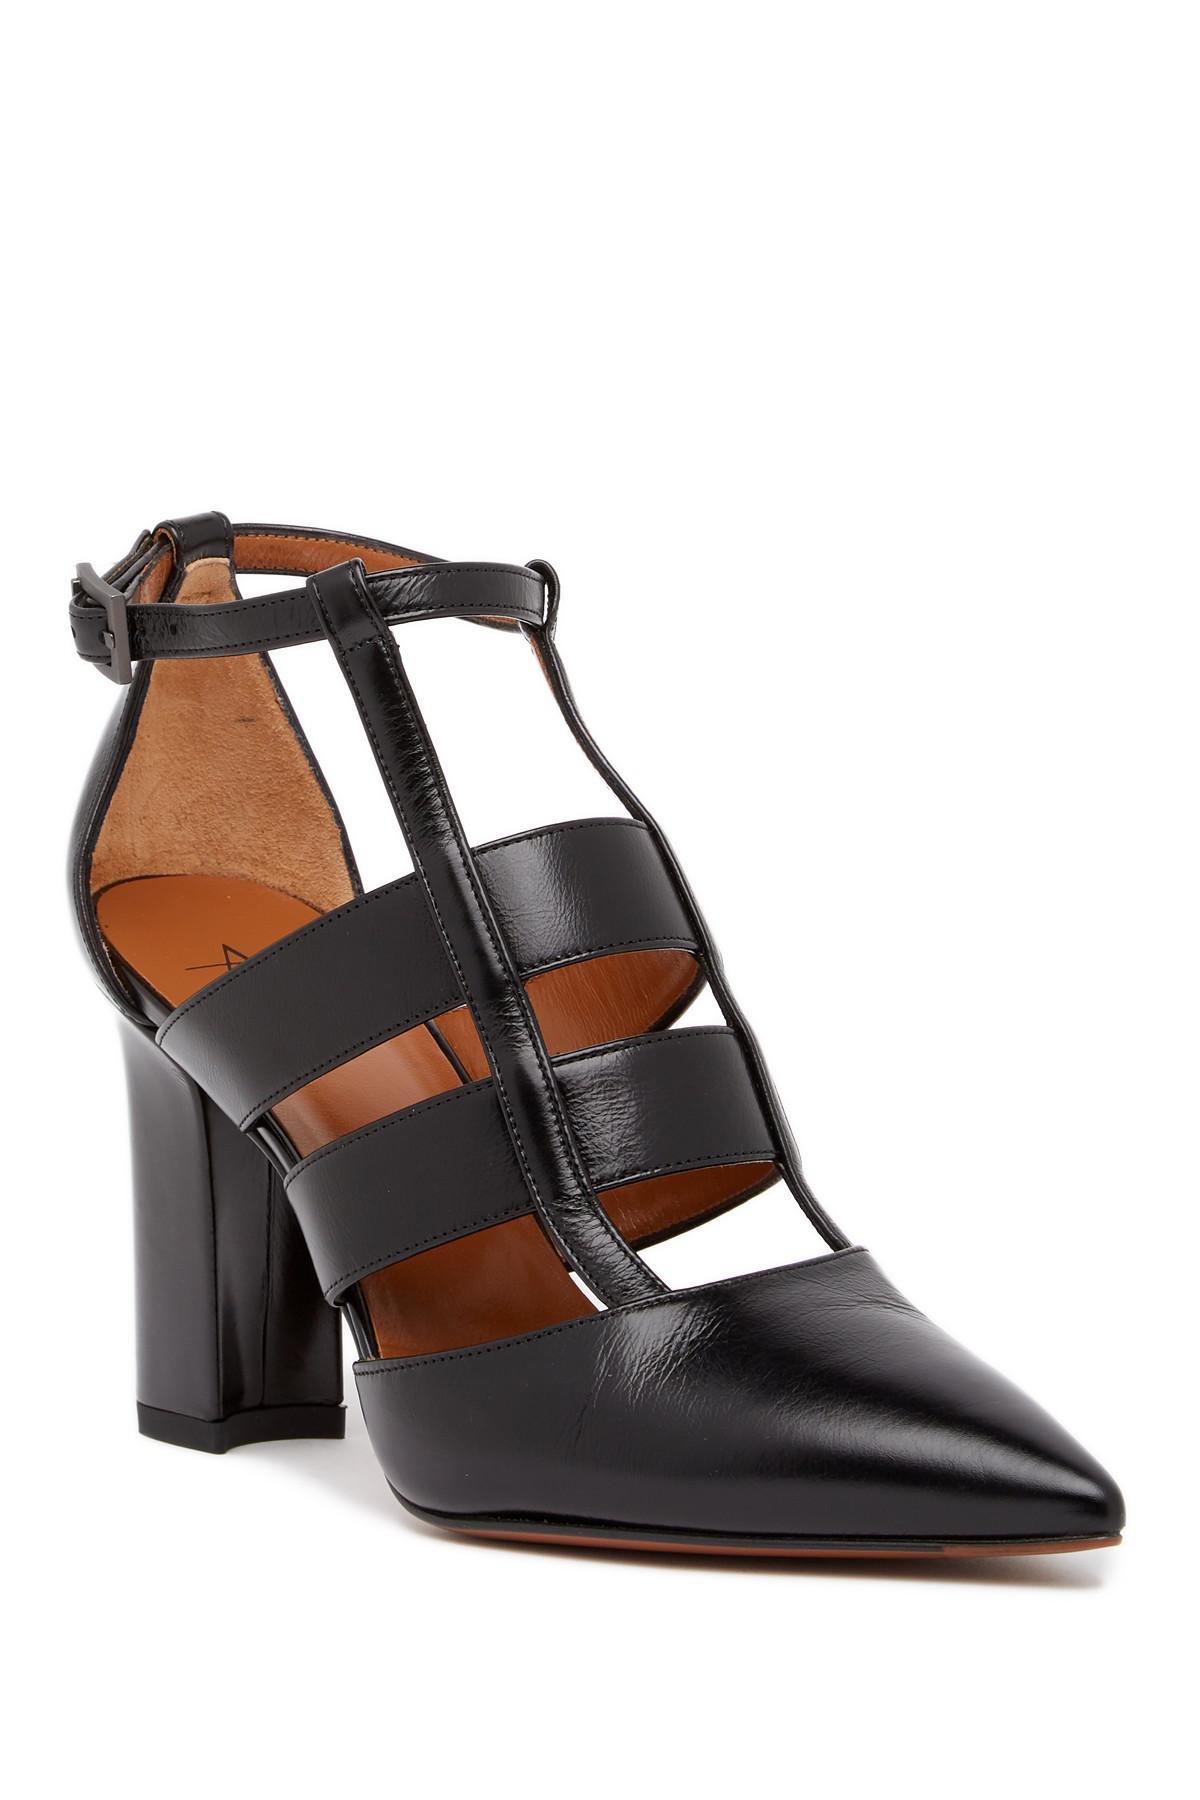 1e0280459bf Lyst - Aquatalia Helene Weatherproof Caged Pointed Toe Pump in Black